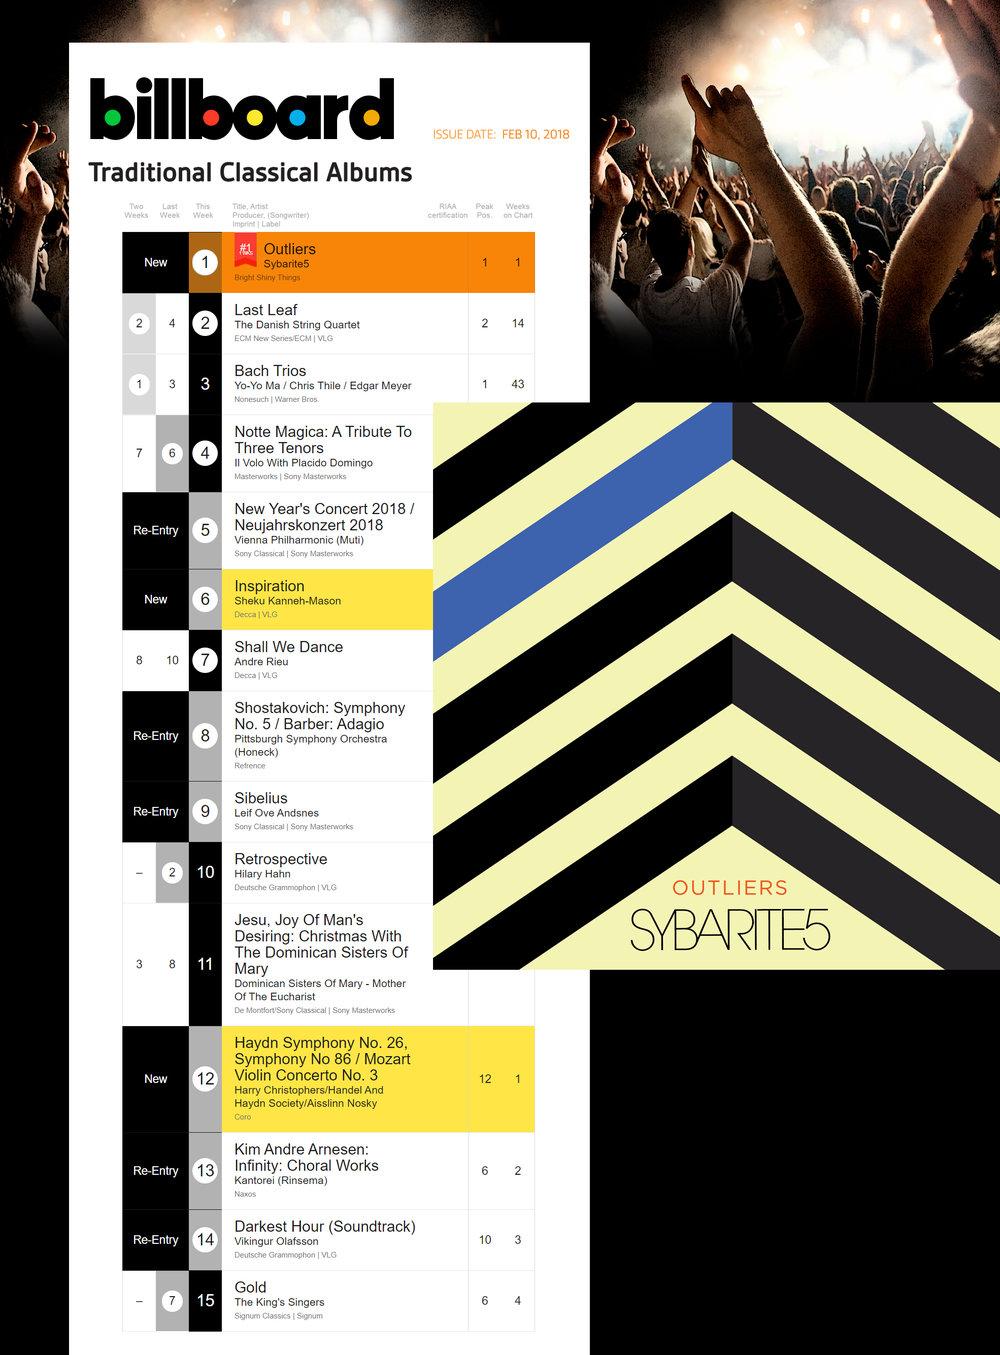 2017_WK52_IHM_BB_Charts_300dpi_Sybarite5 (2).jpg